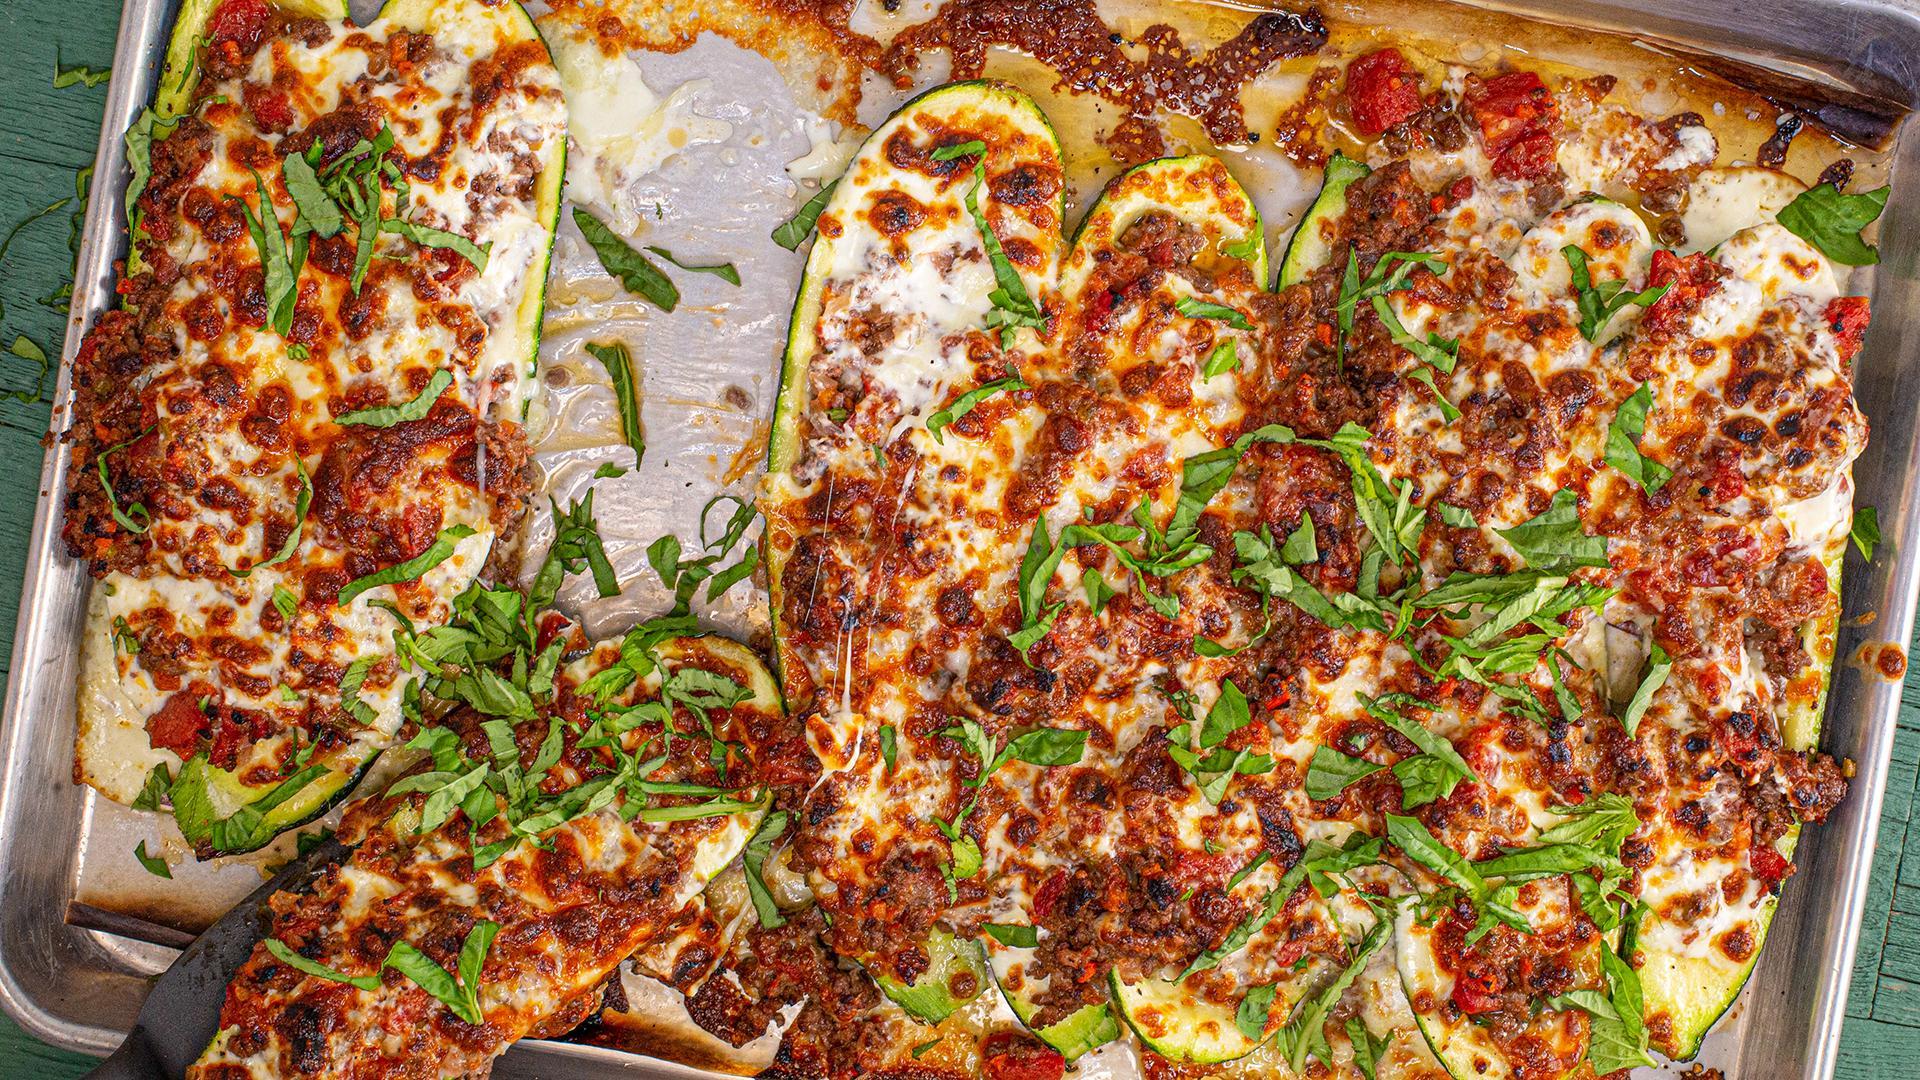 Keto Lasagna Style Stuffed Zucchini Rachael Ray Show